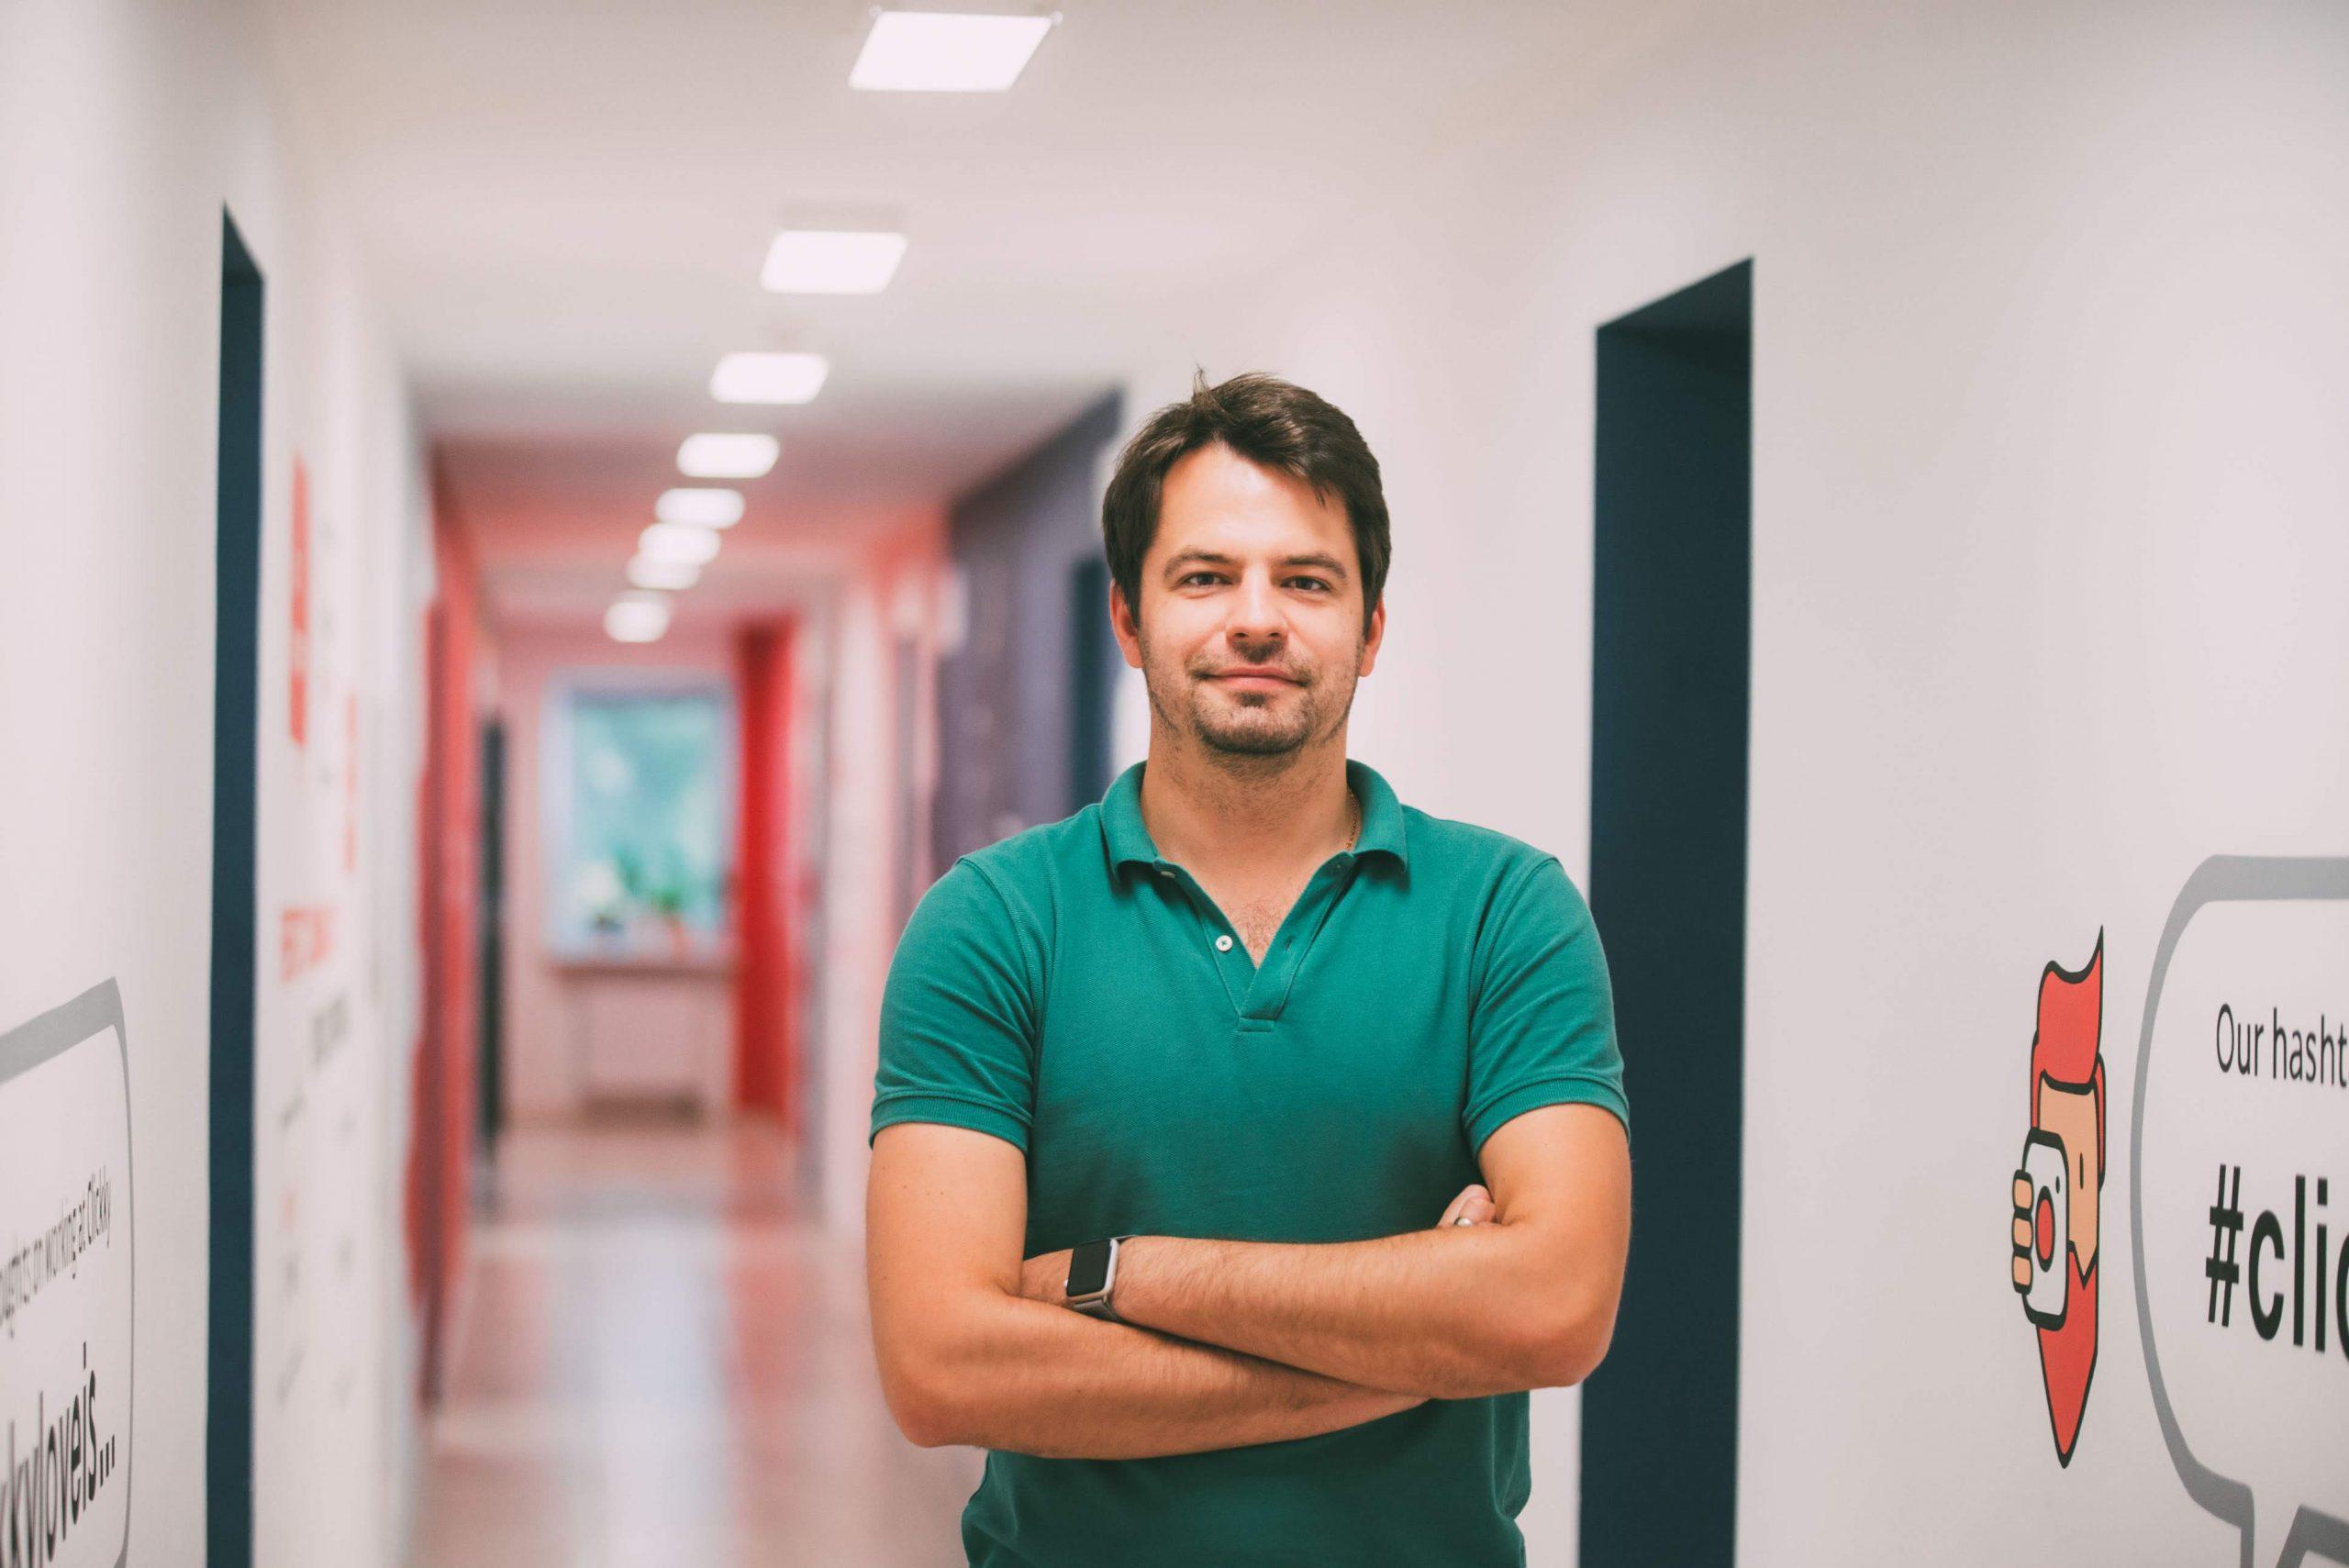 Вадим Роговский 3DLOOK. Фото: Николай Вдовенко